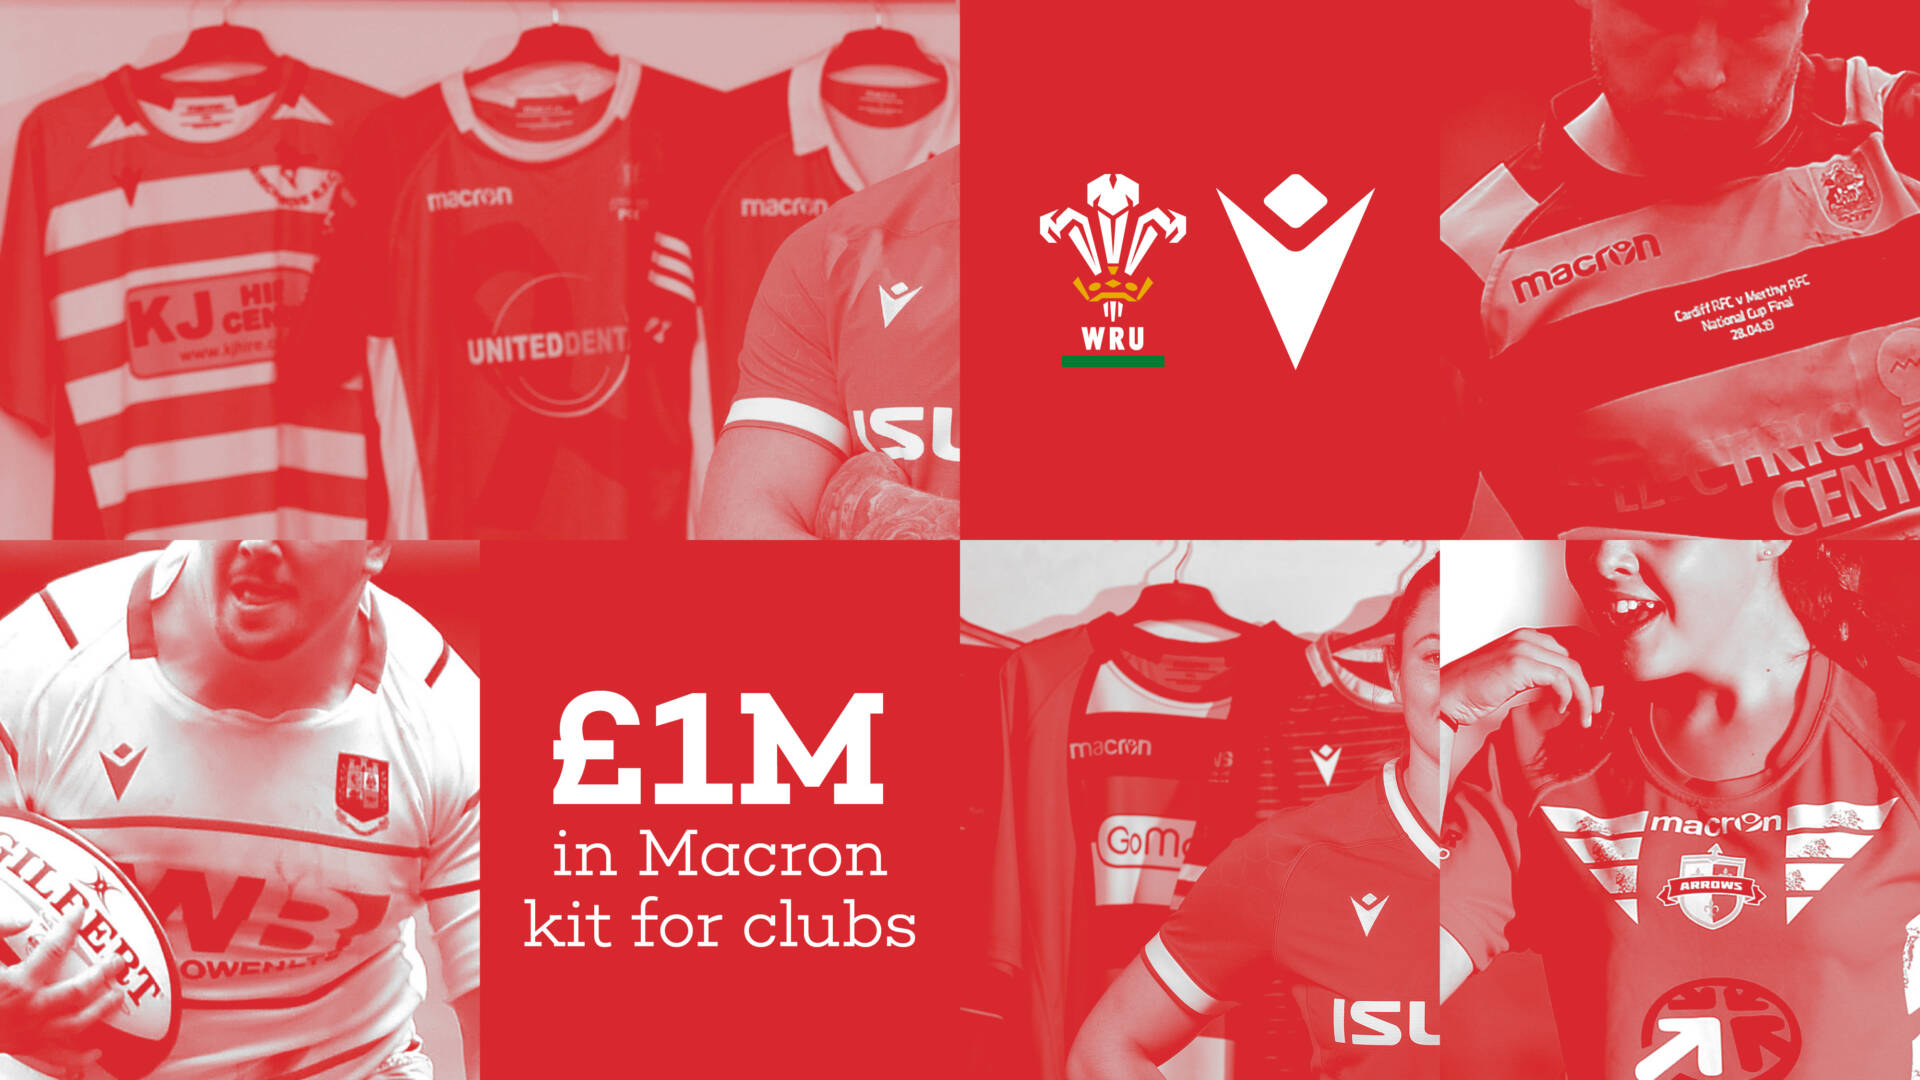 Macron kit for clubs